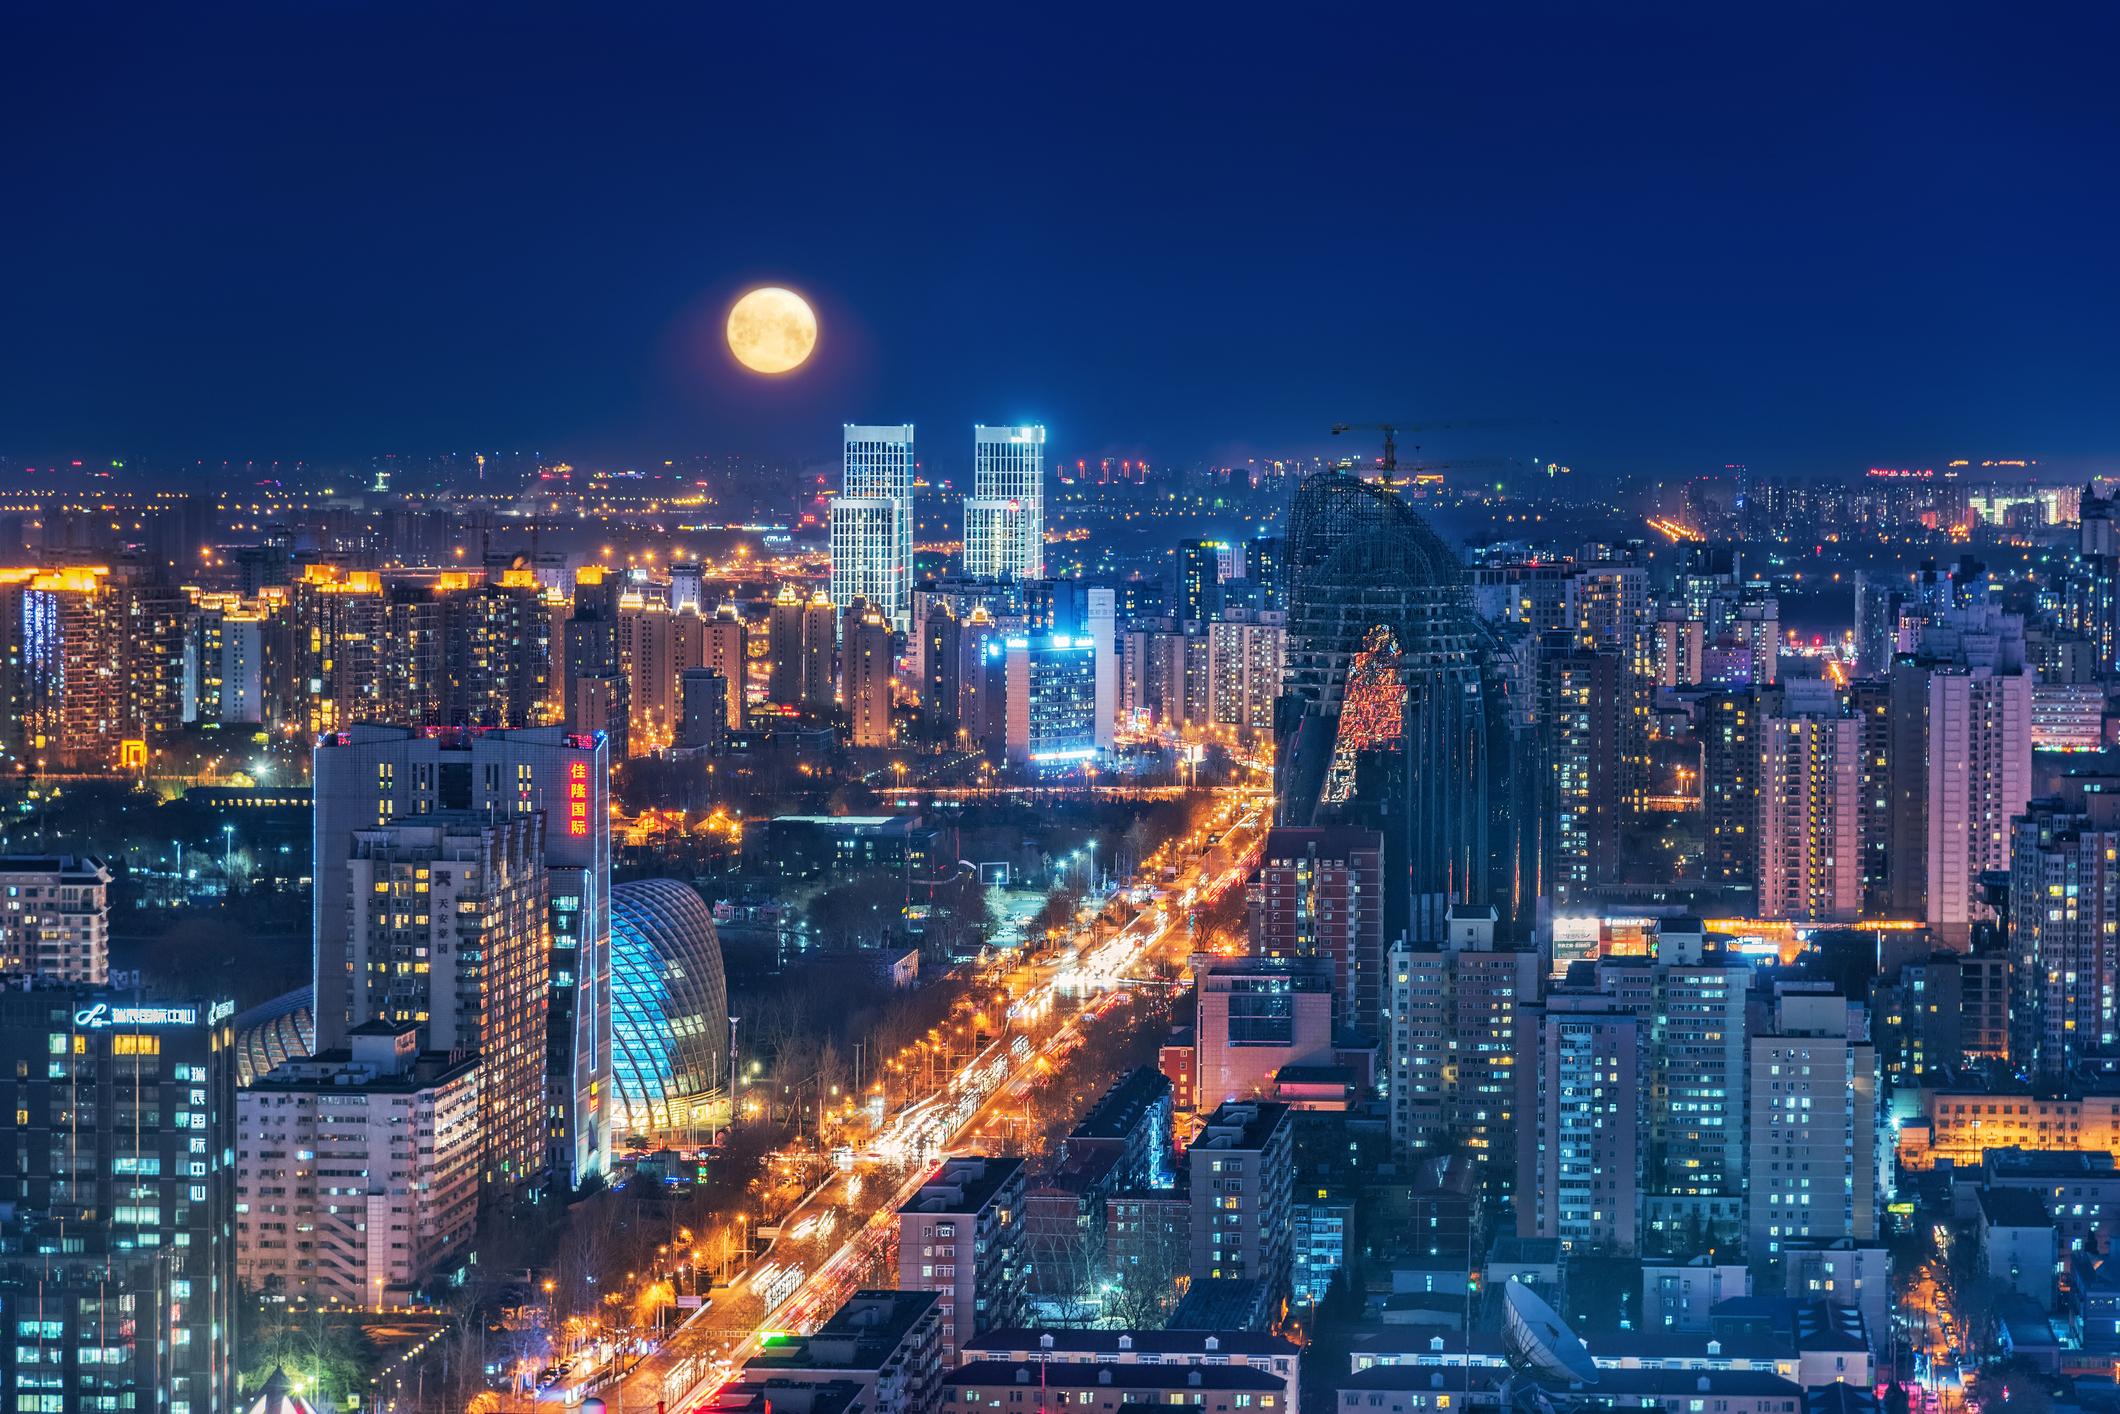 Beijing China urban landscape at night.